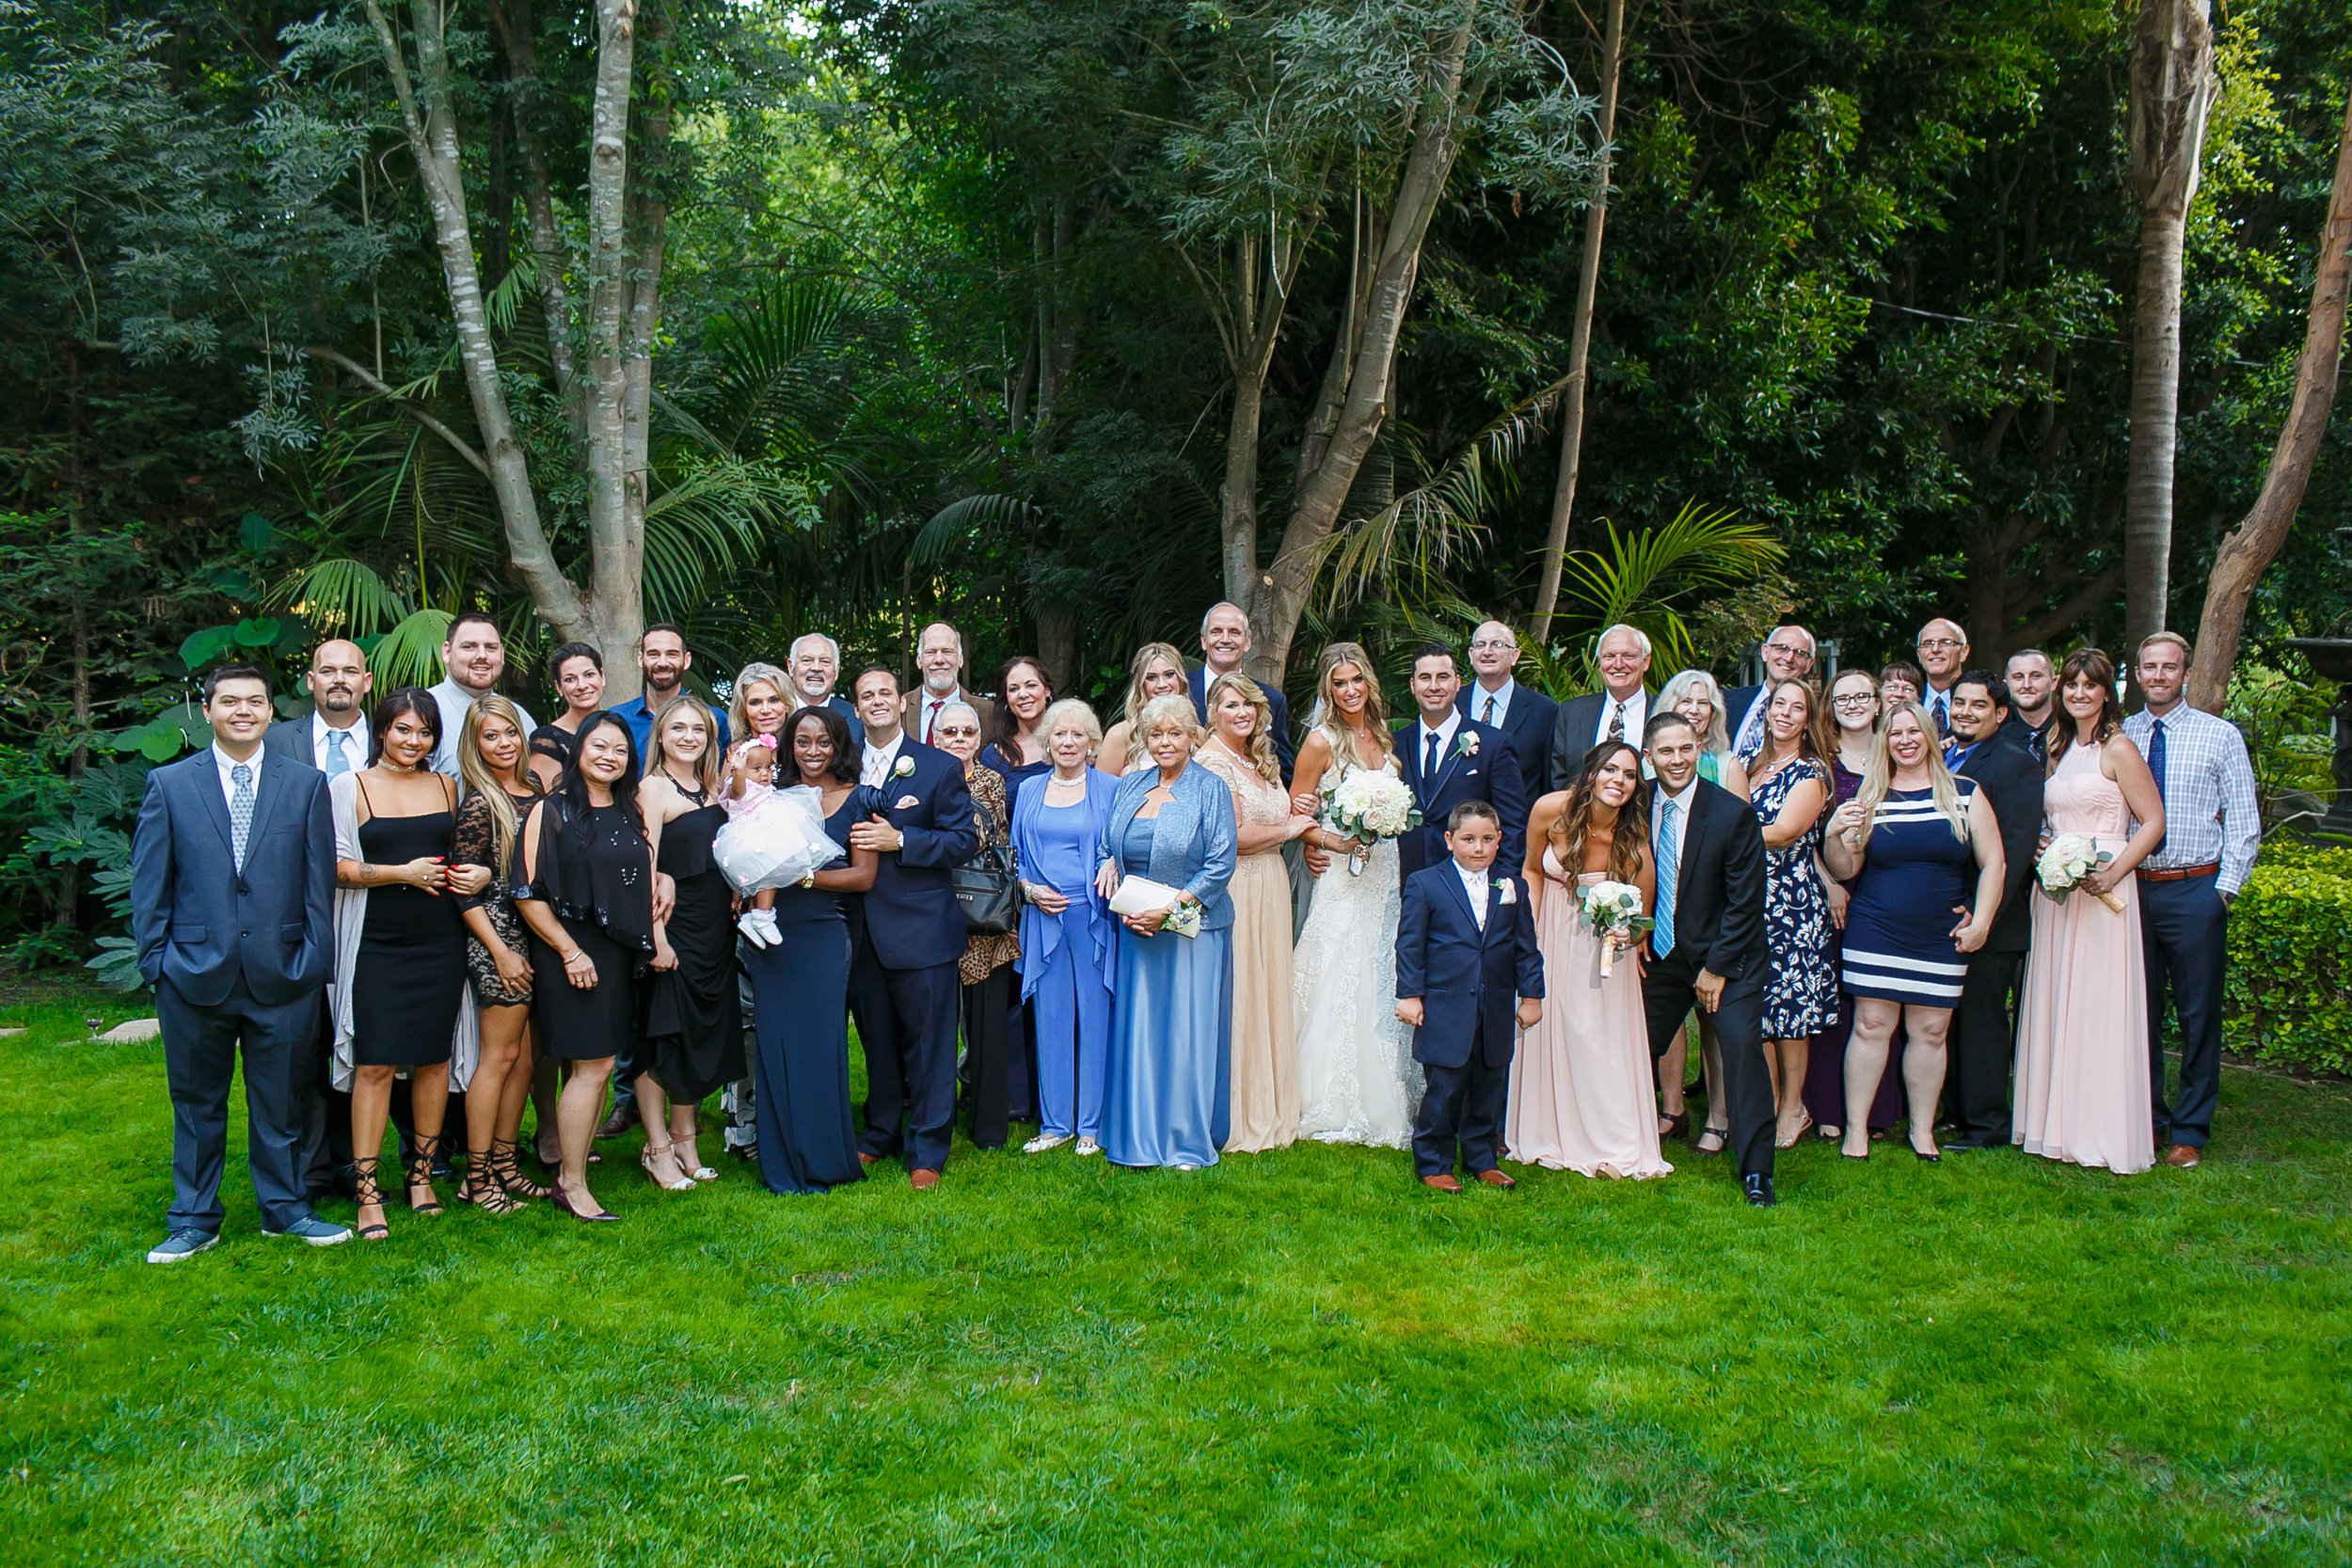 WEDDING AT HARTLEY BOTANICA IN SOMIS, CALIFORNIA